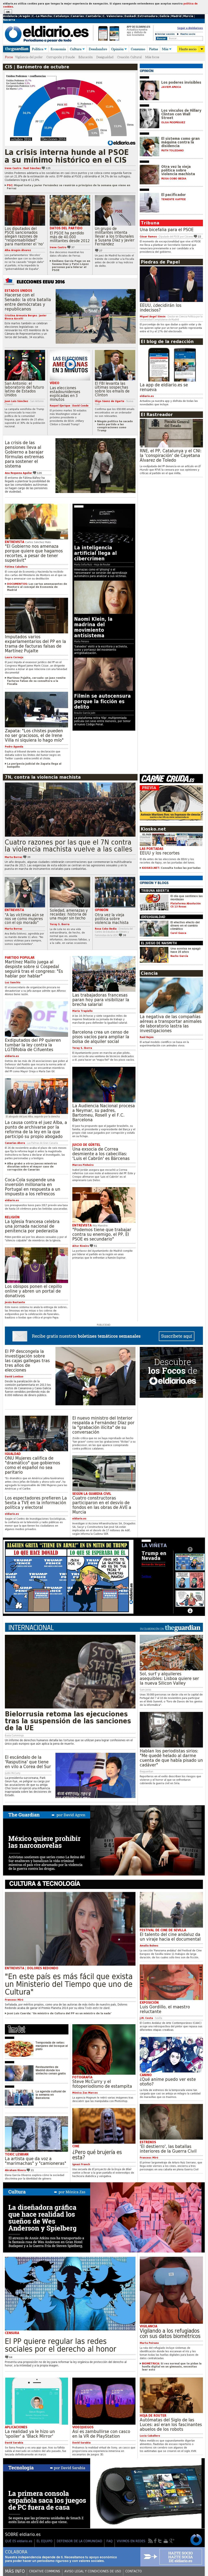 El Diario at Monday Nov. 7, 2016, 4:04 p.m. UTC